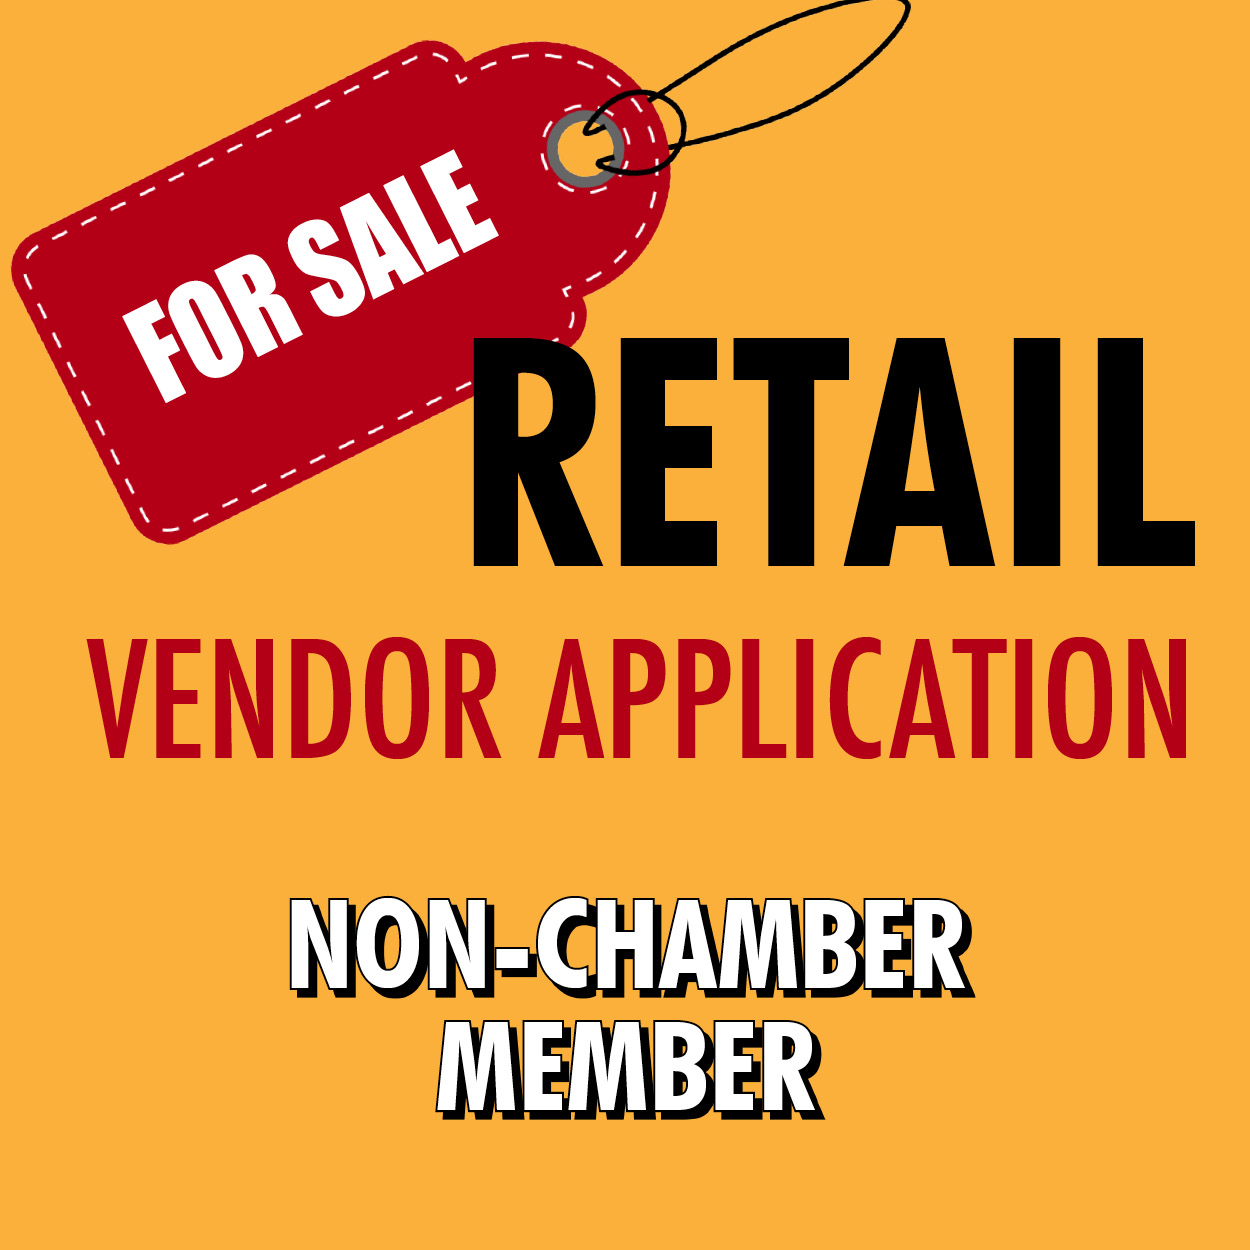 VendorFormIcons6(1).jpg